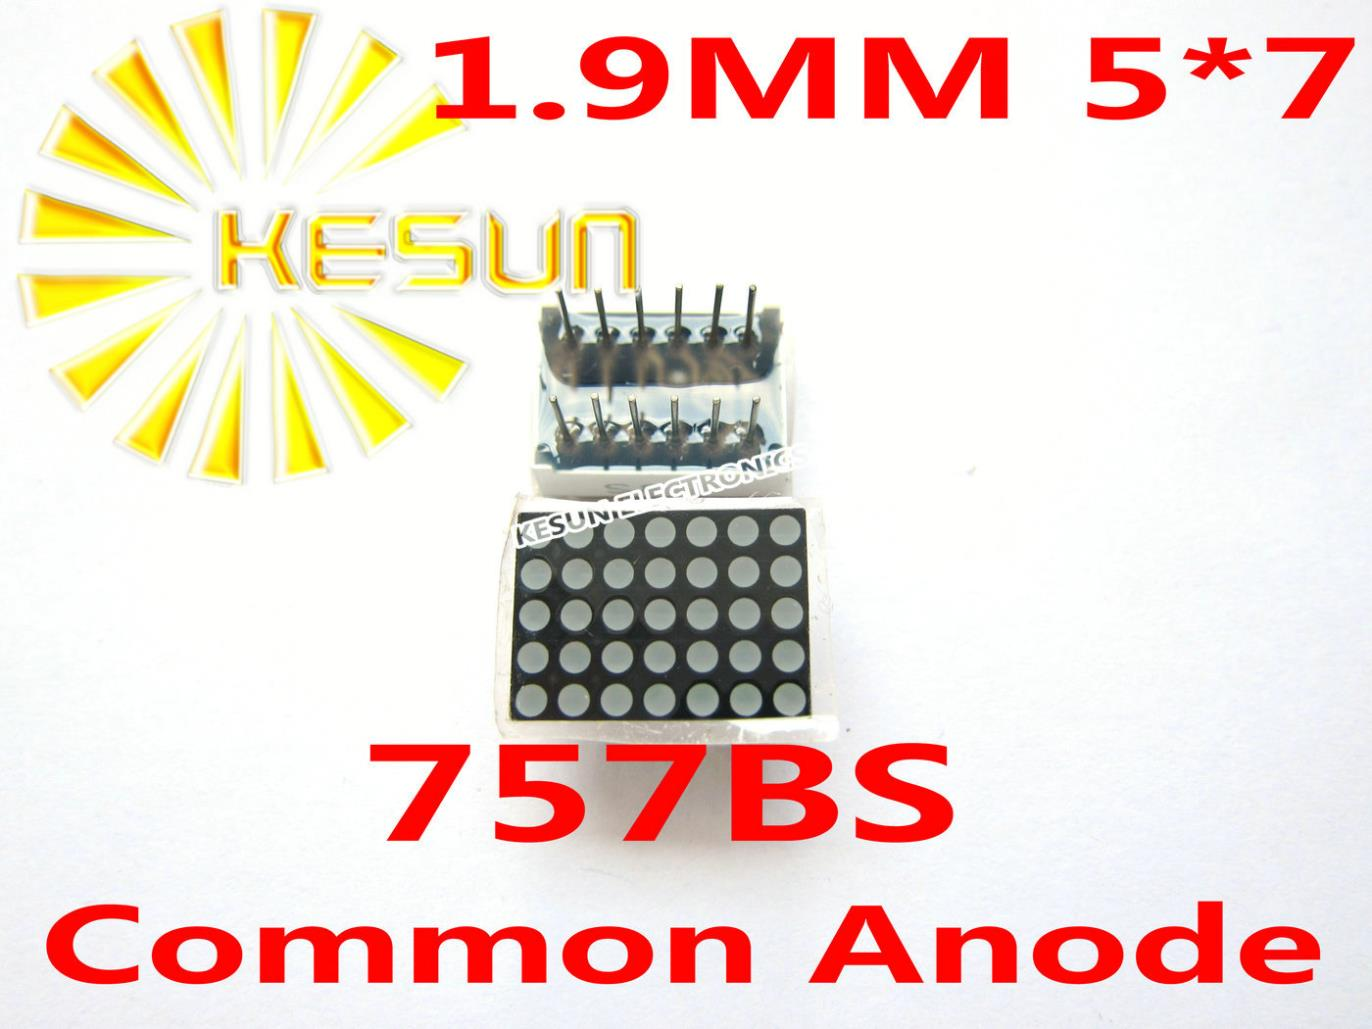 Envío Gratis, 10 Uds. x 1,9 MM 5X7, módulo de tubo Digital de matriz de puntos de ánodo común LED rojo, 757BS Módulo De Pantalla LED